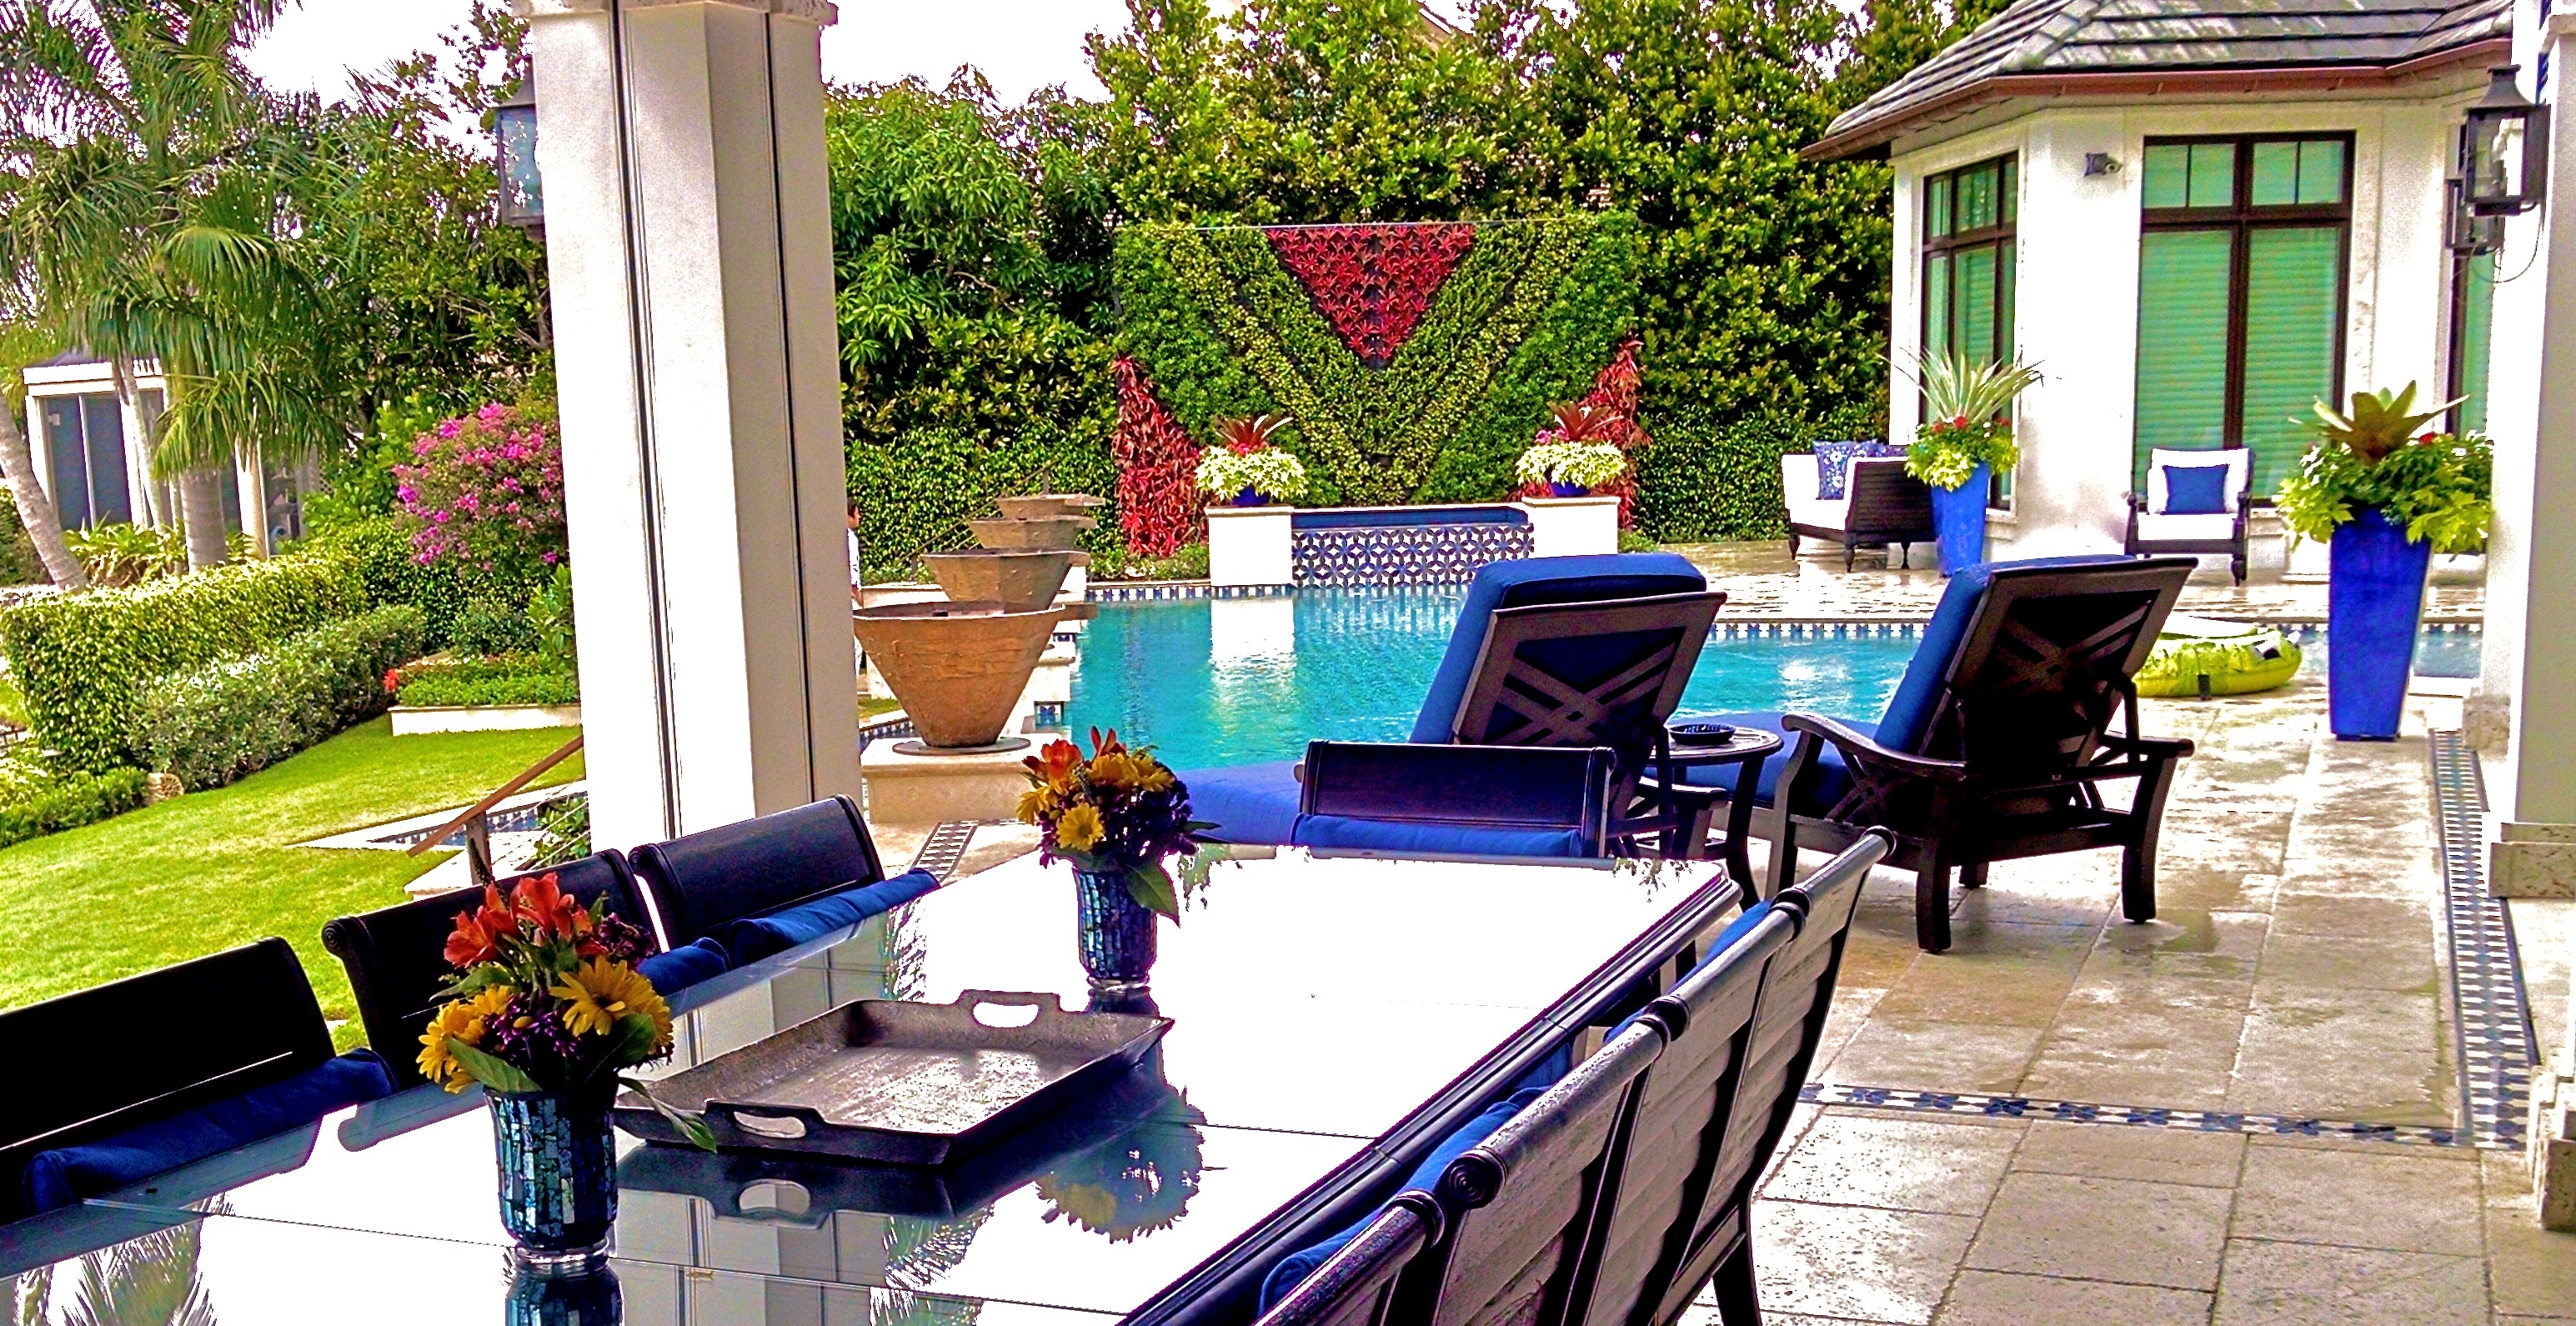 Best Green wall   Great Vertical garden in Miami Florida USA best example of Biophilic Design By Biophilic designer Jeffrey Allis